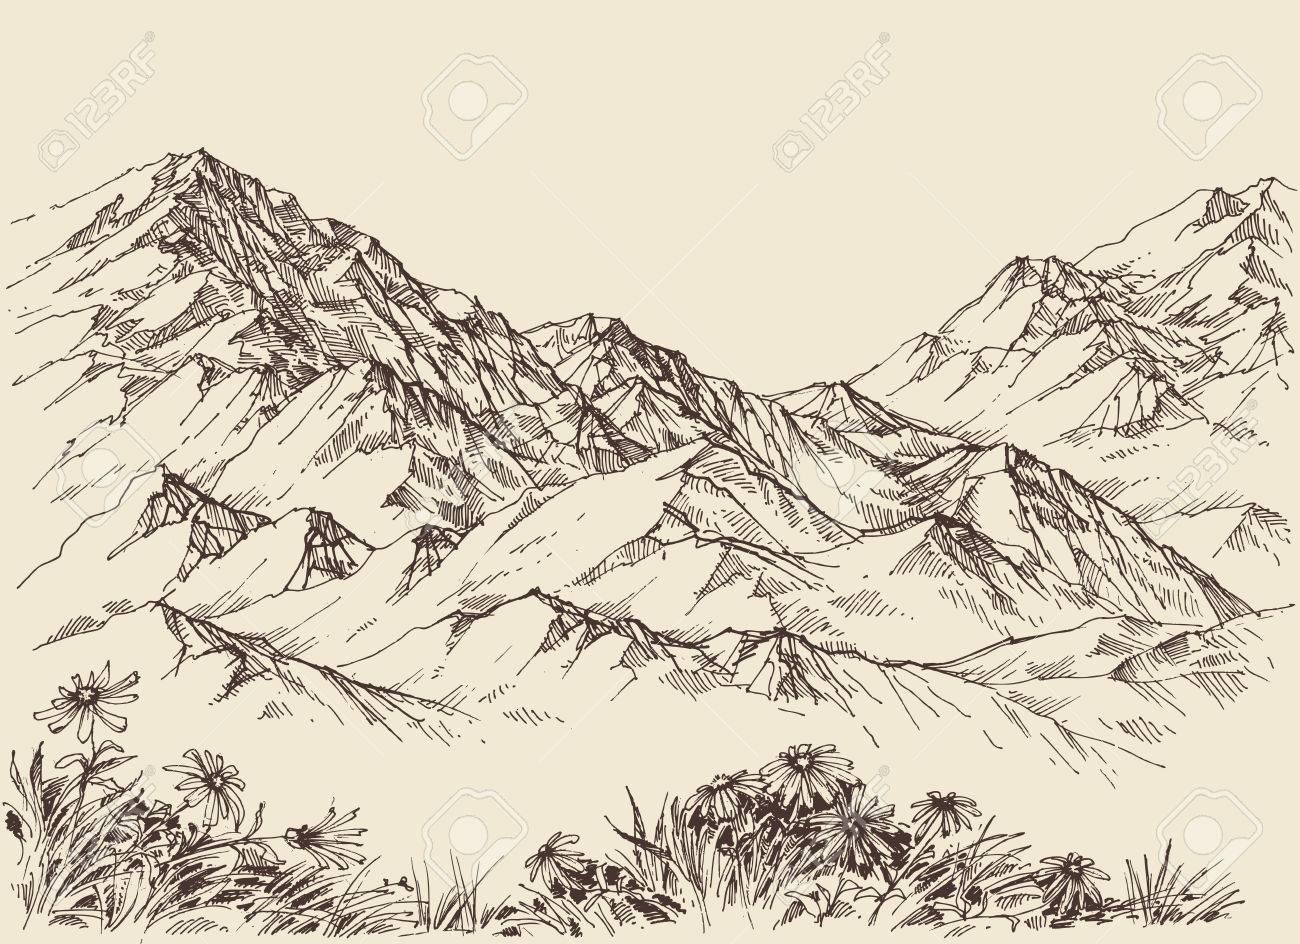 Mountain peaks, altitude landscape - 58689448